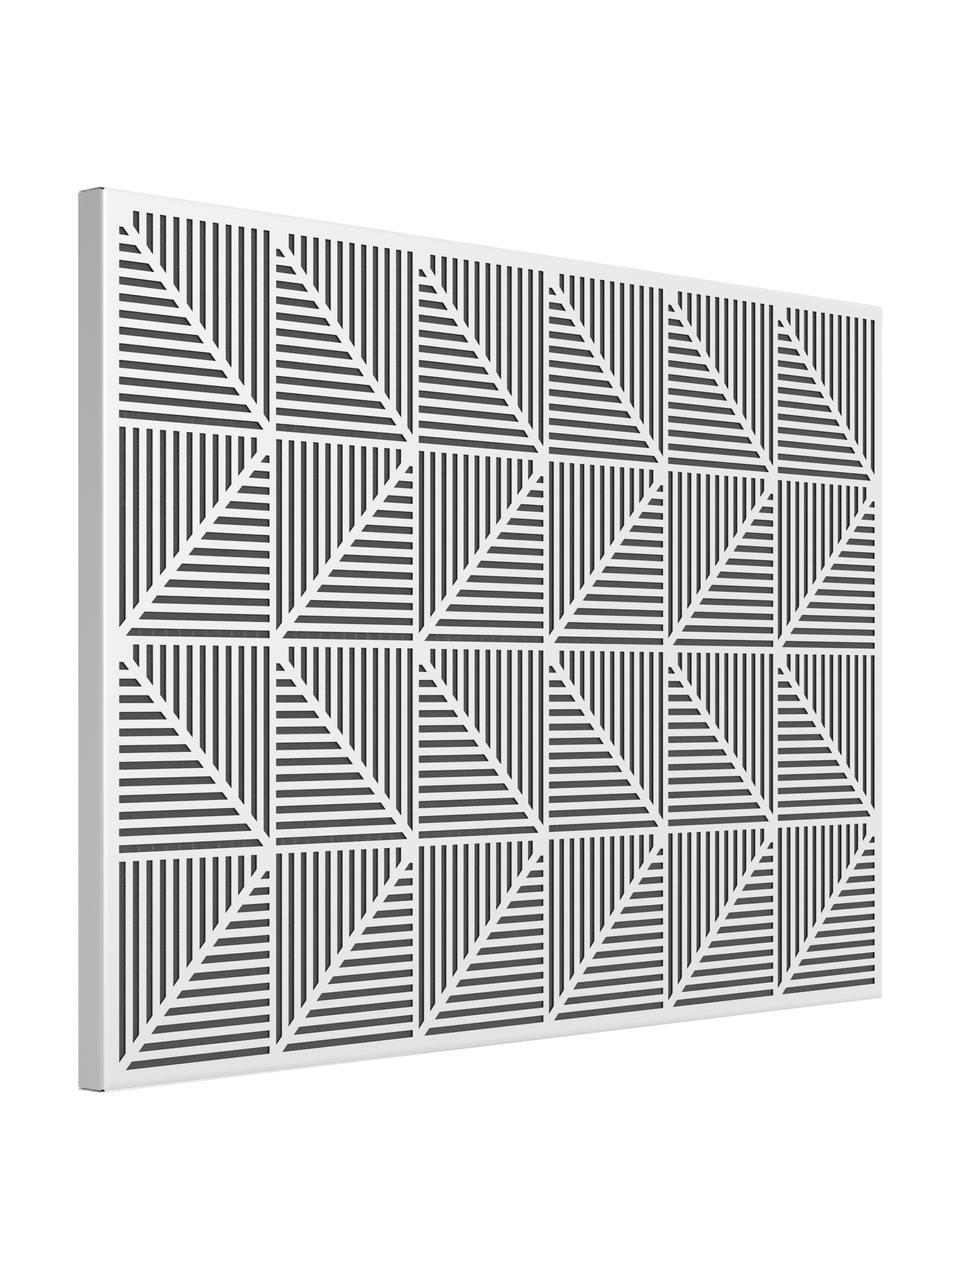 Tablero Trigon, Metal, goma espuma, Blanco, An 53 x Al 38 cm